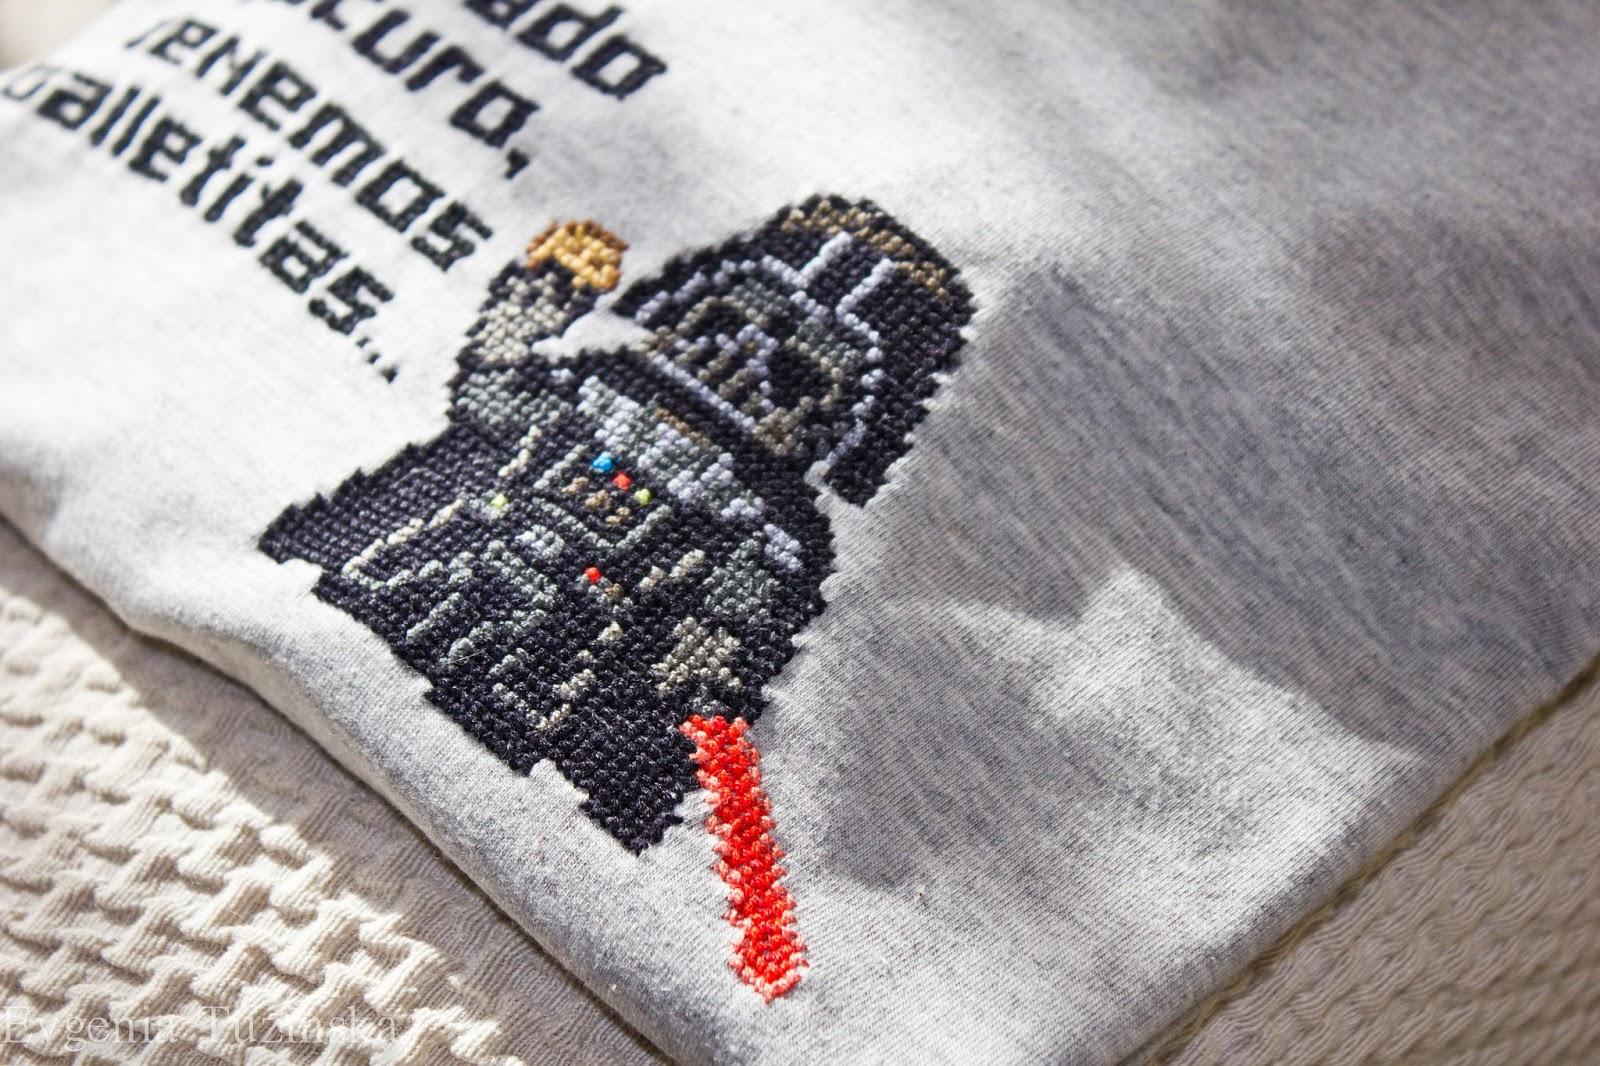 Схема вышивки дарта вейдера